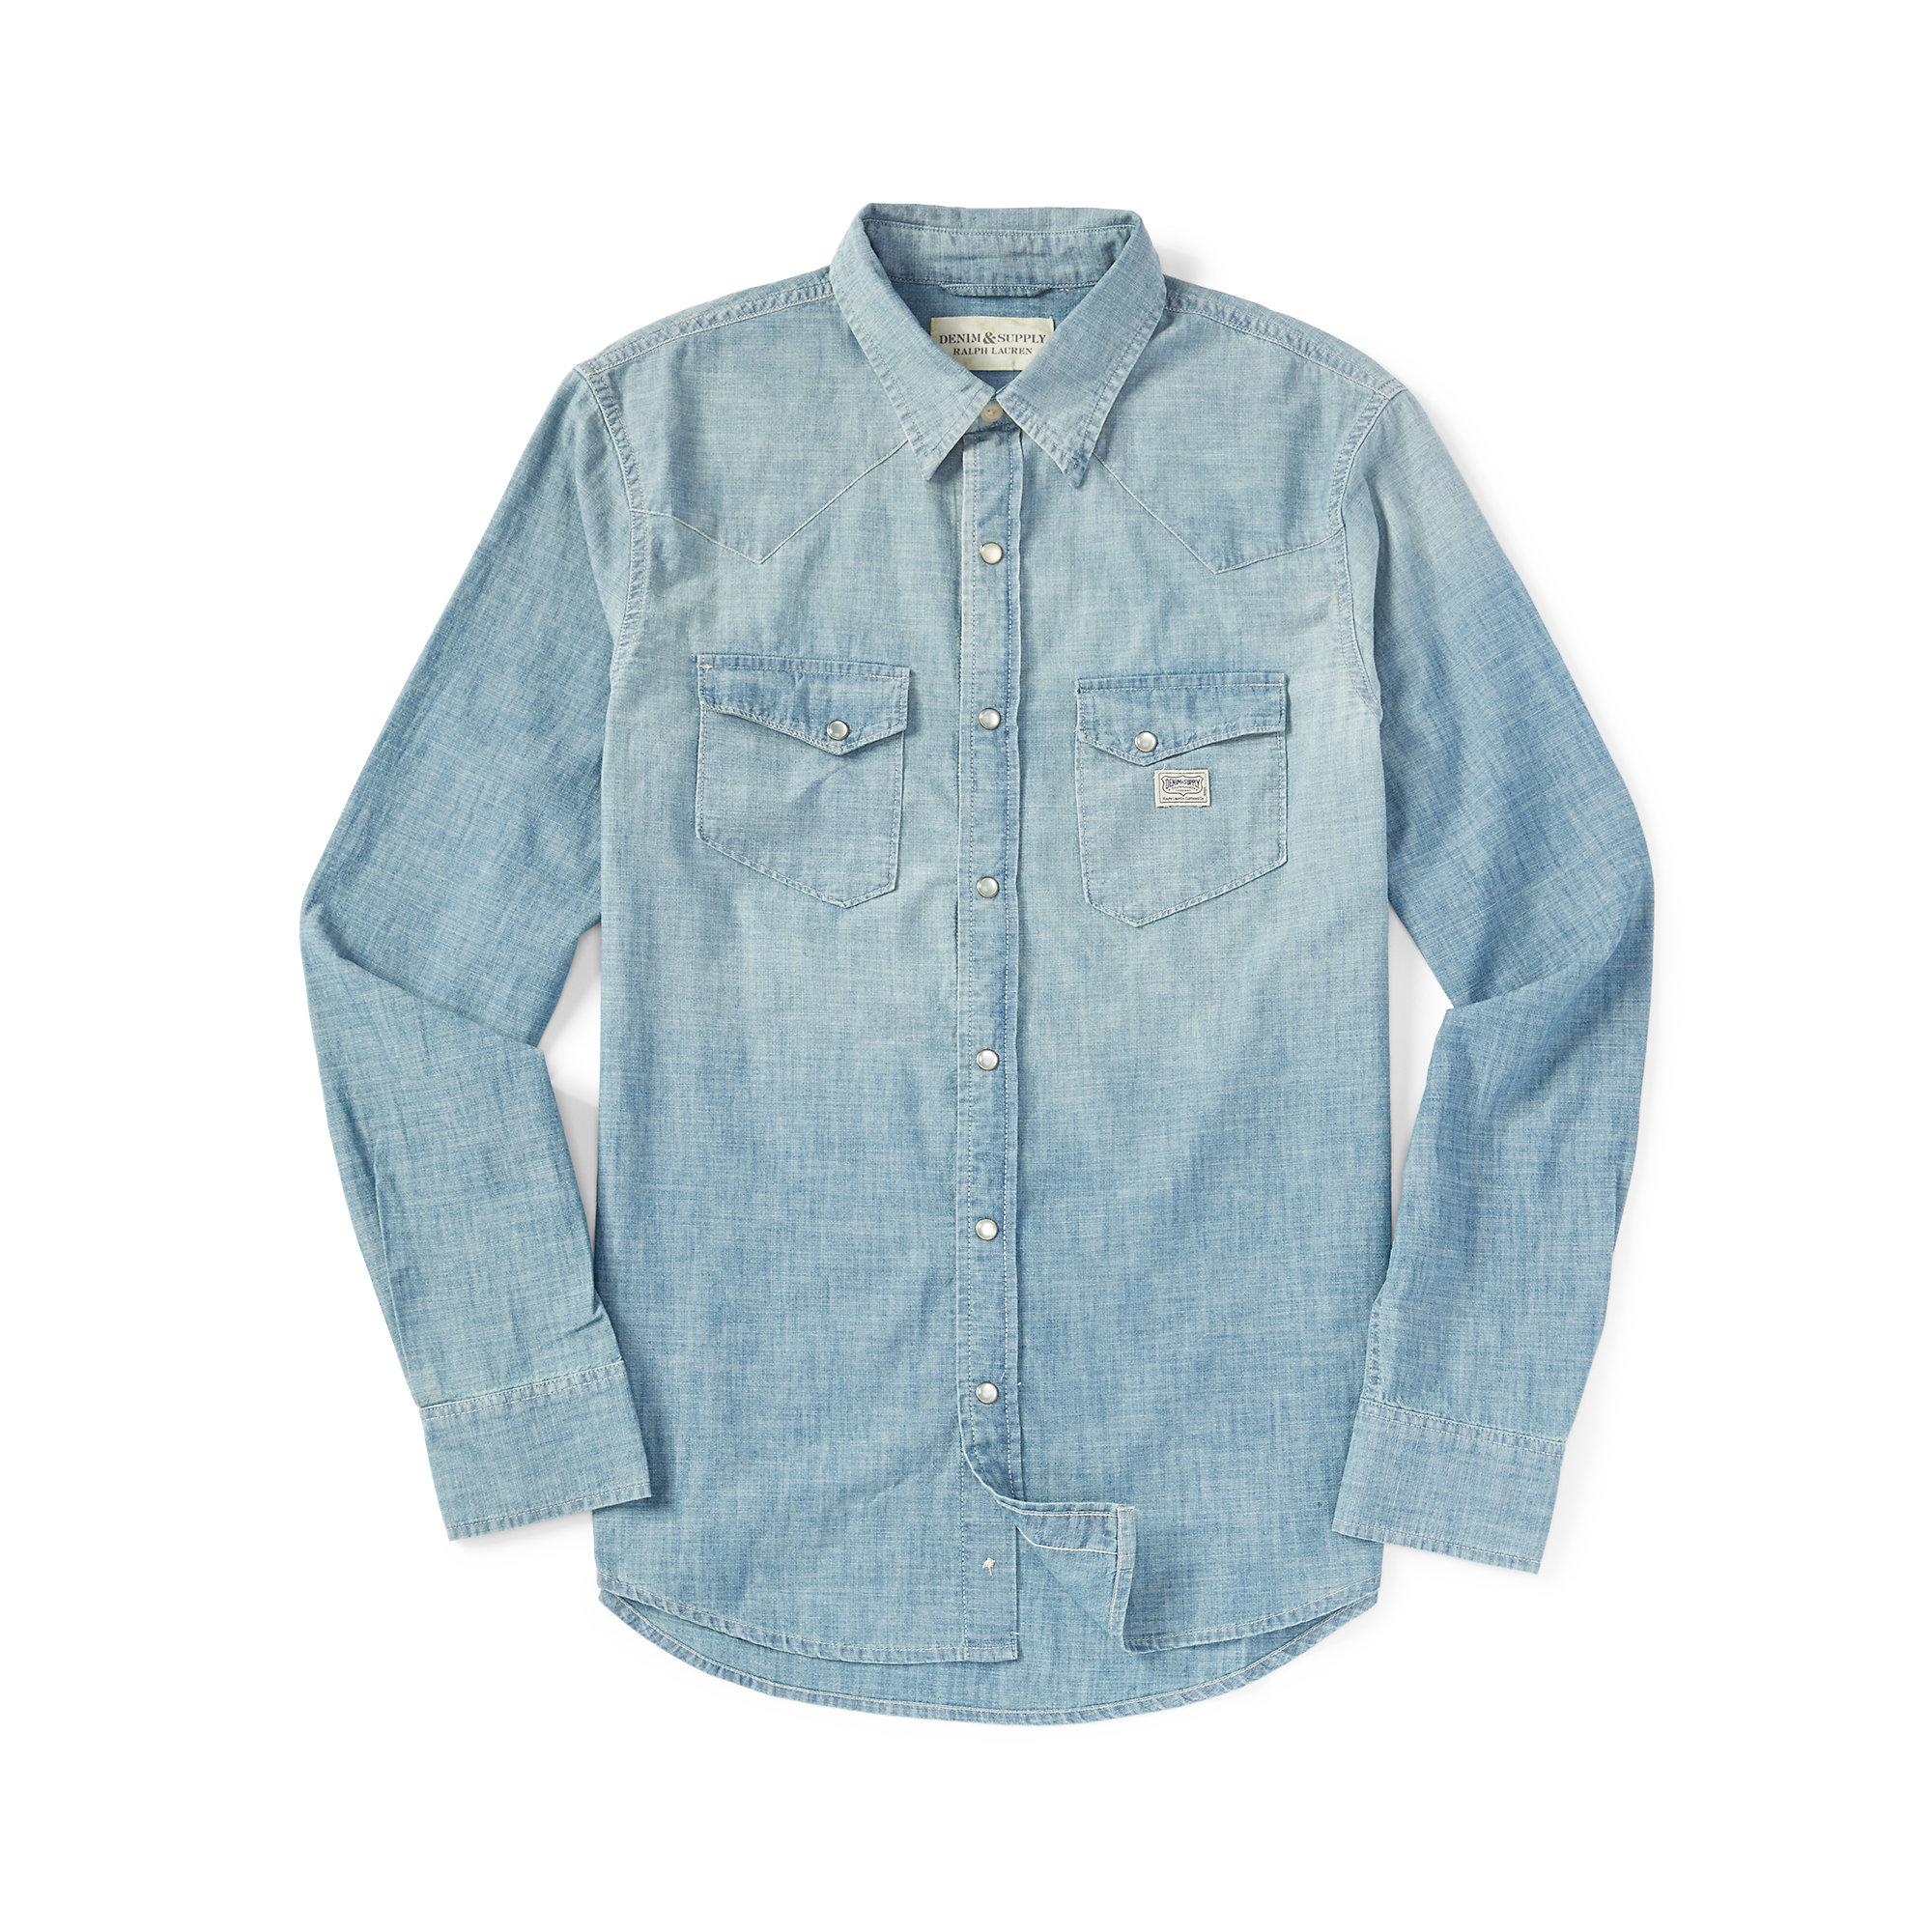 SHIRTS - Shirts Denim & Supply Buy Cheap Genuine Wil3GqT